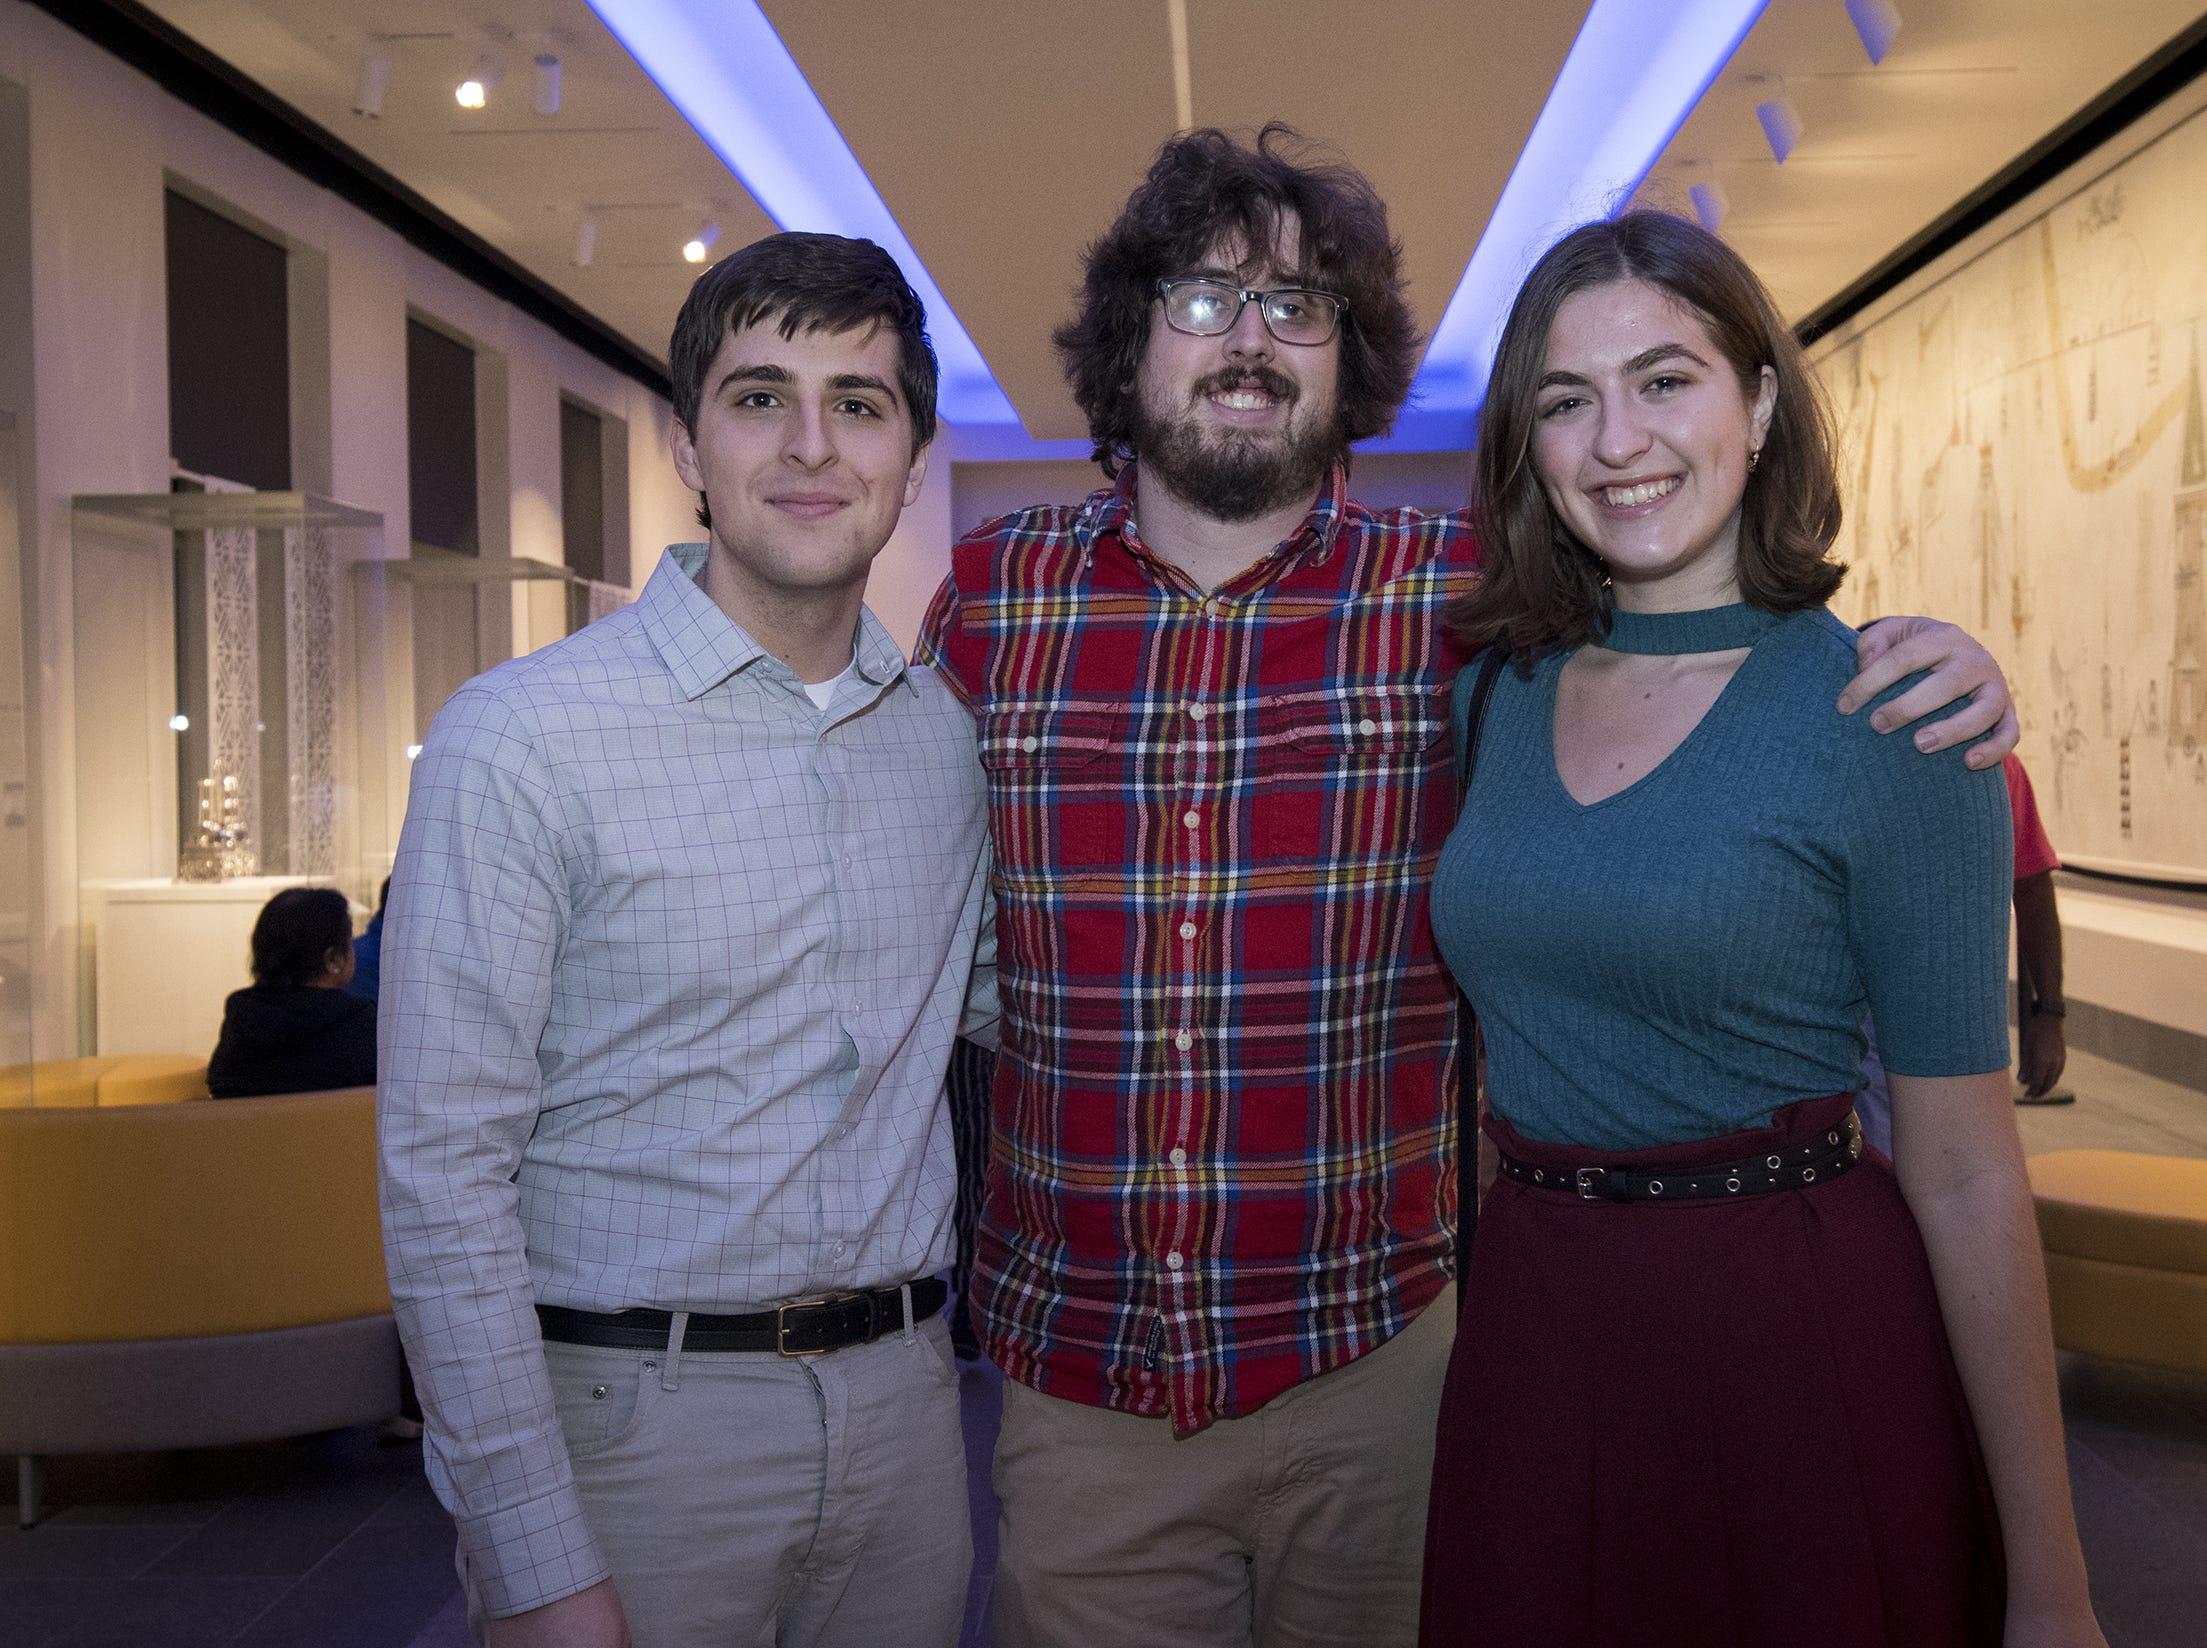 Weston Rainer, Alex McCartney and Ivanka Rainer attend Art After Dark at the Cincinnati Art Museum Wednesday, November 21, 2018 in Cincinnati, Ohio.